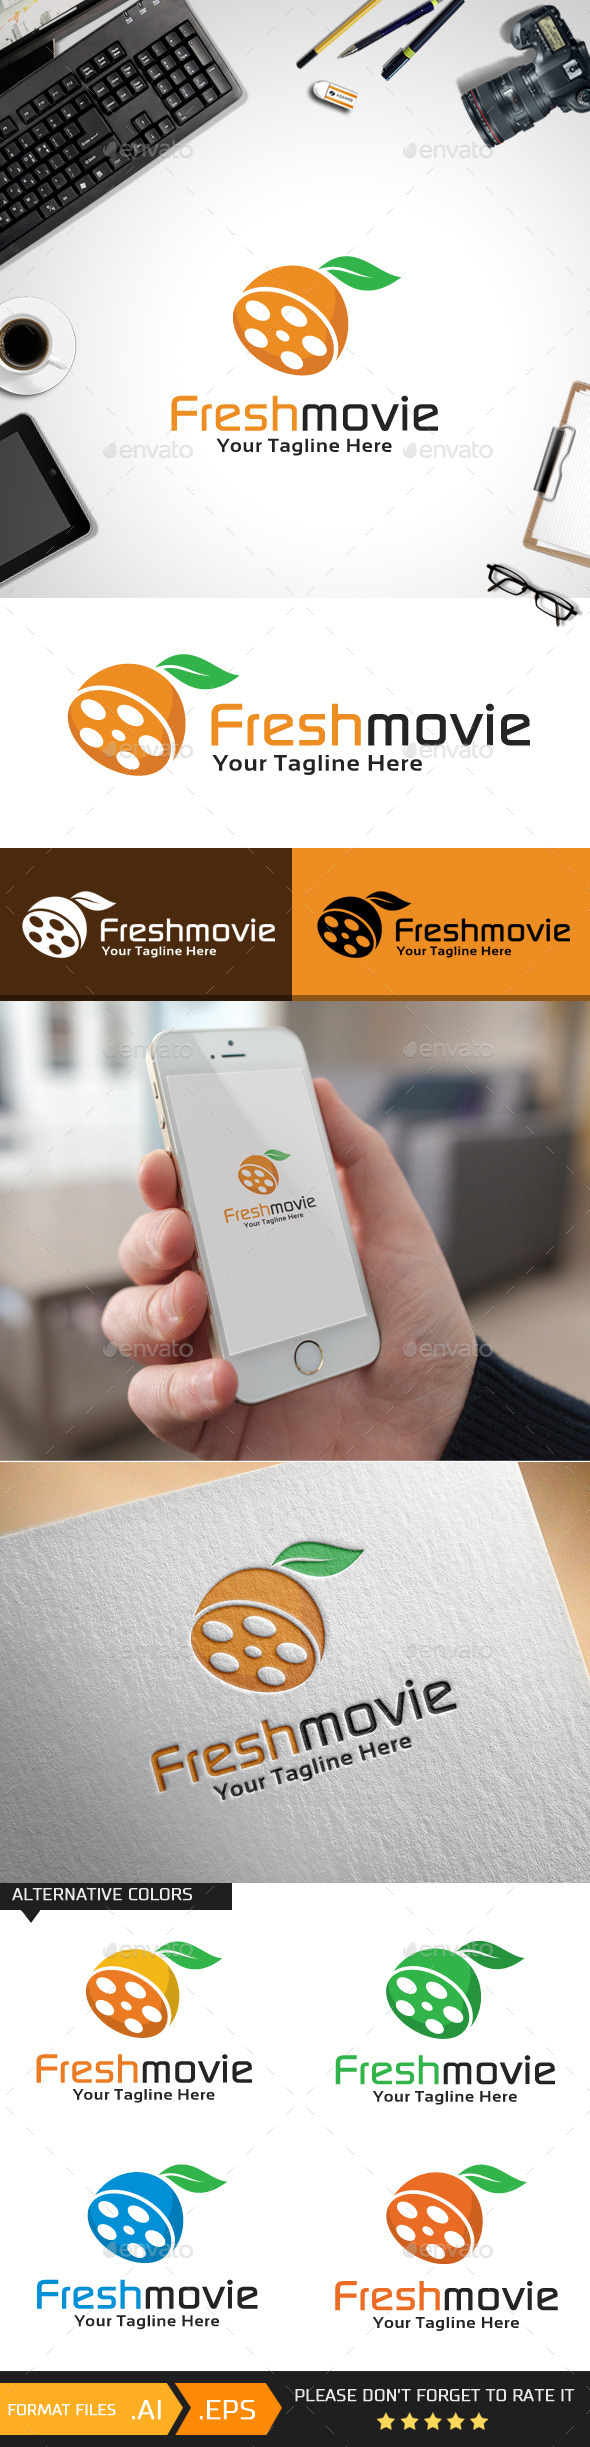 Freshmovie Logo Template